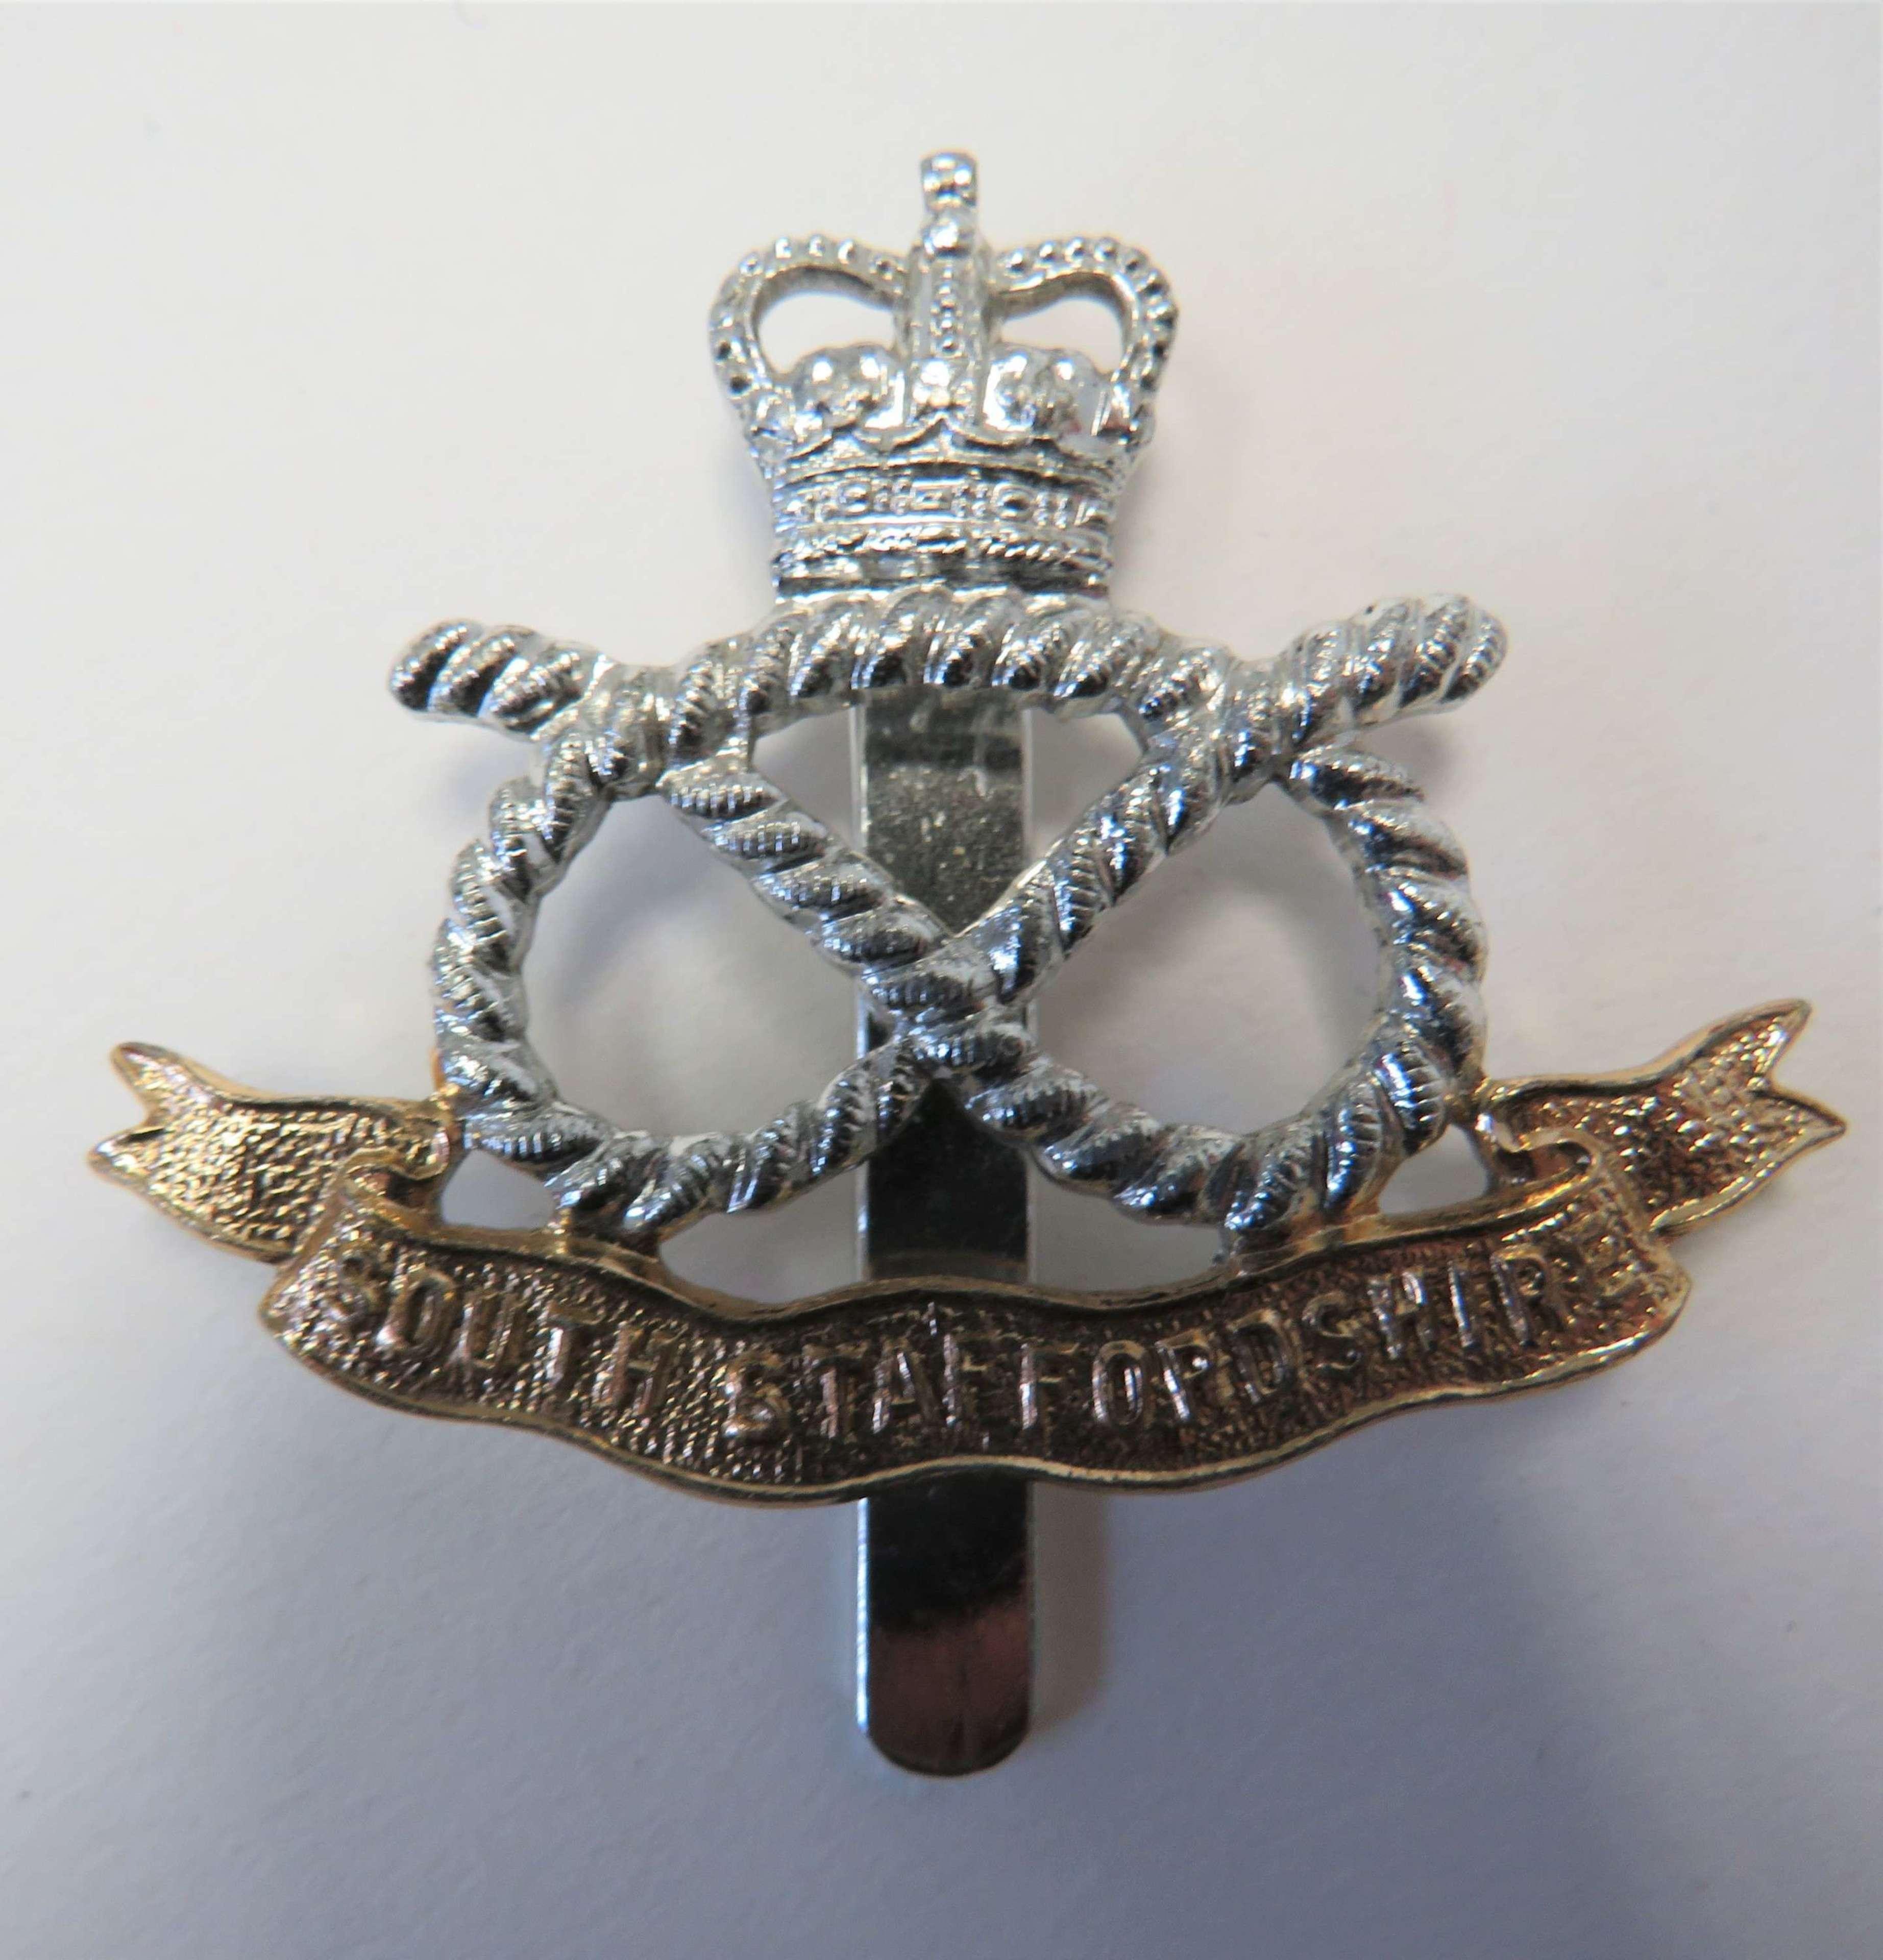 Anodised South Staffordshire Regiment Cap Badge